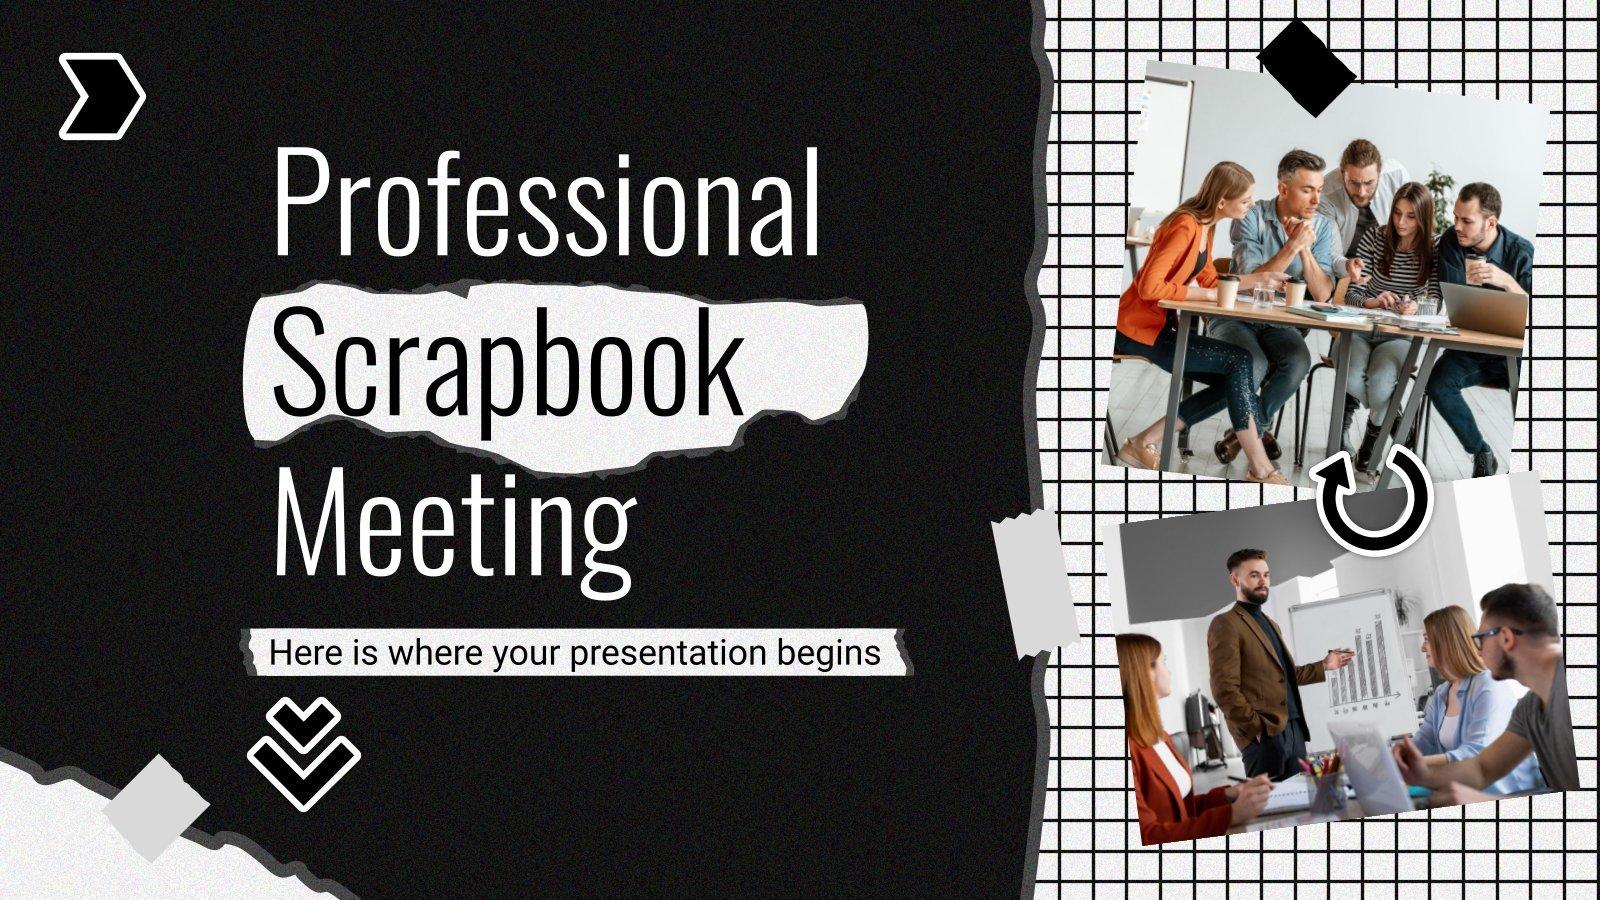 Plantilla de presentación Reunión profesional estilo scrapbook